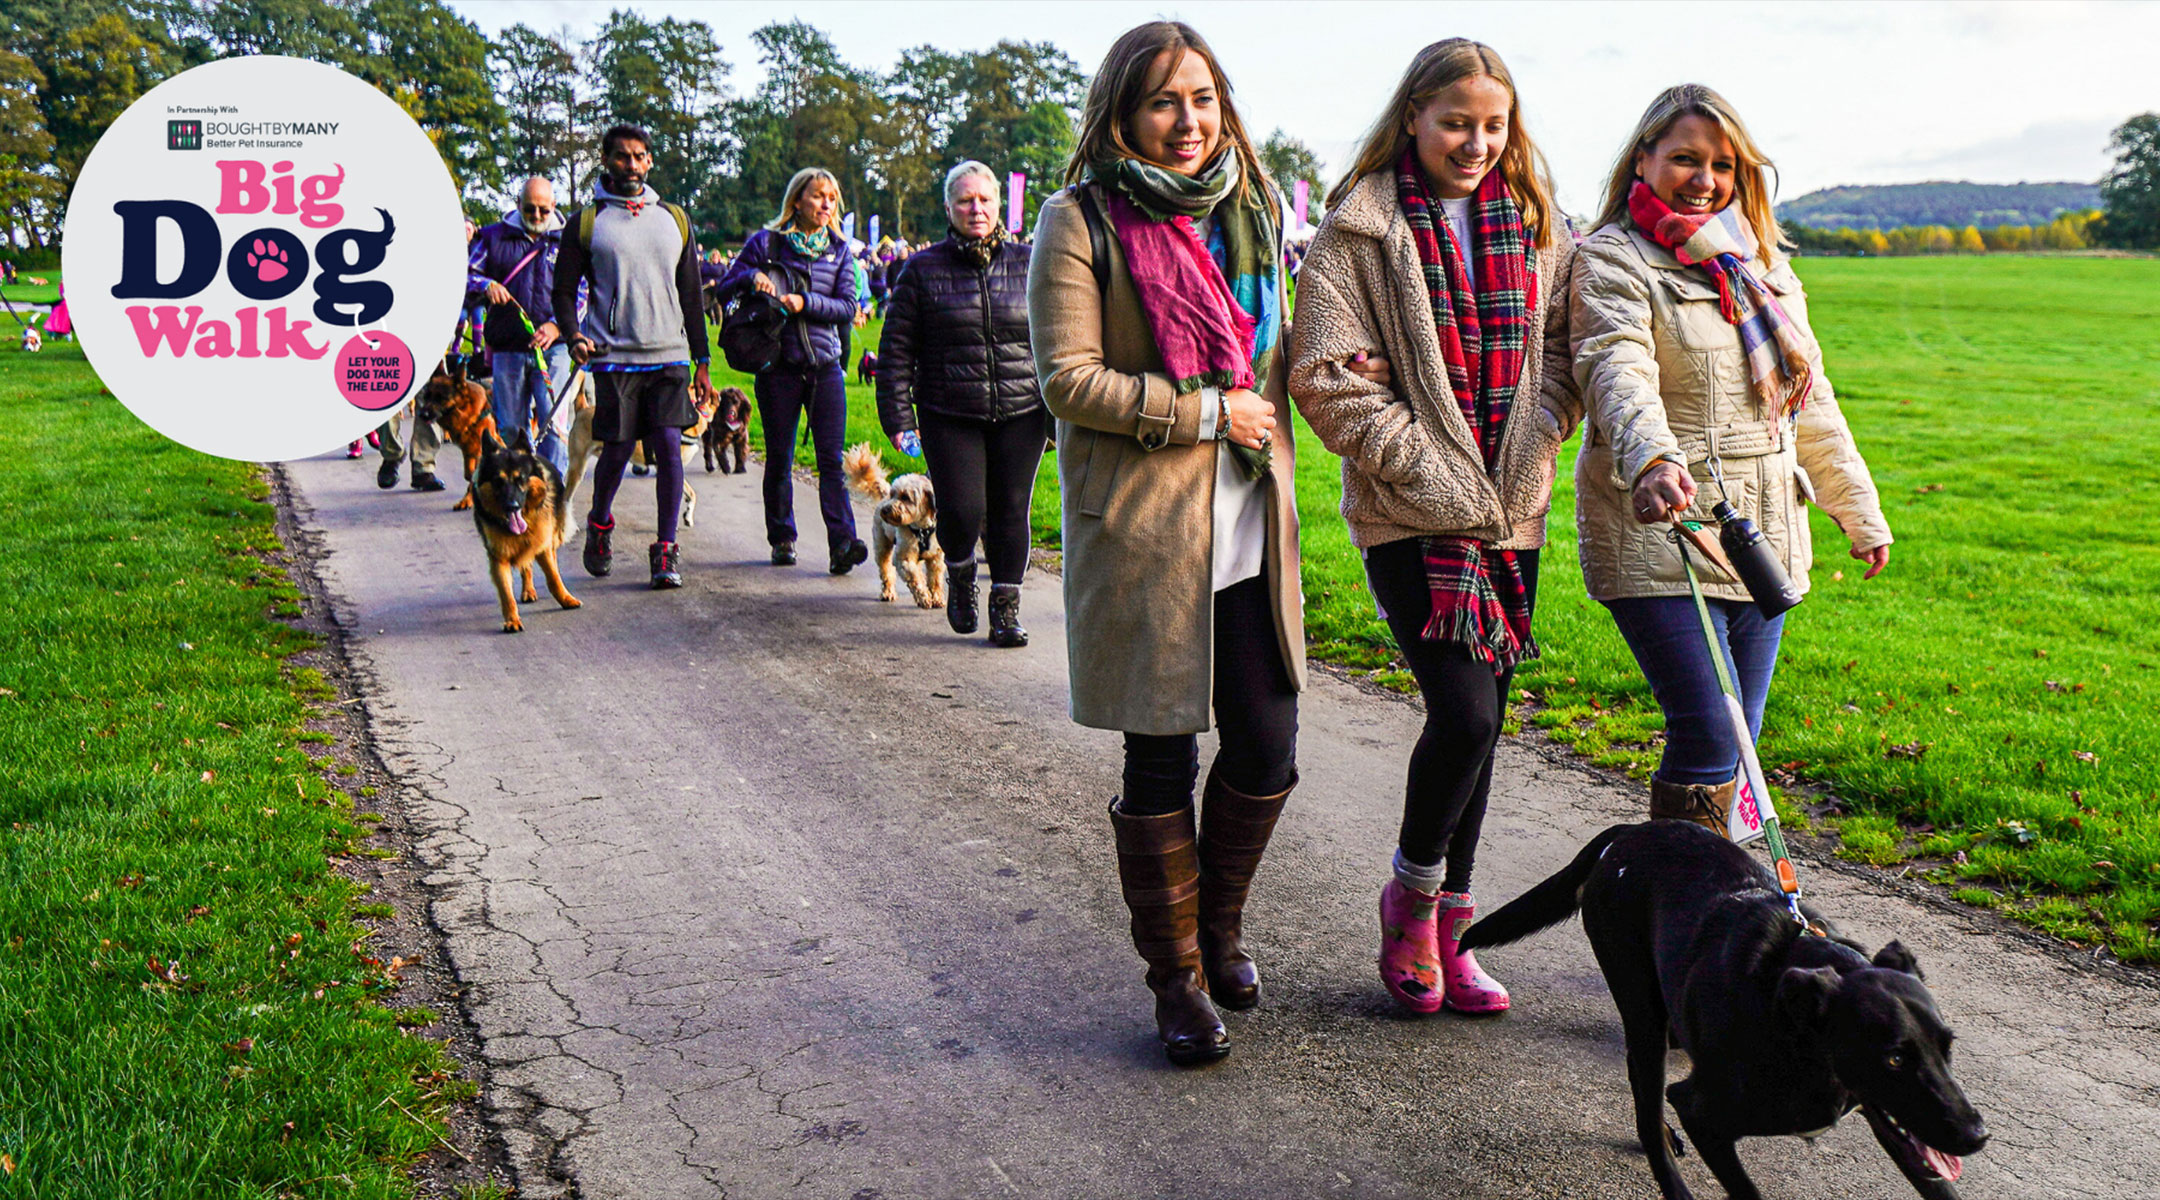 Big Dog Walk Sussex - 13 June